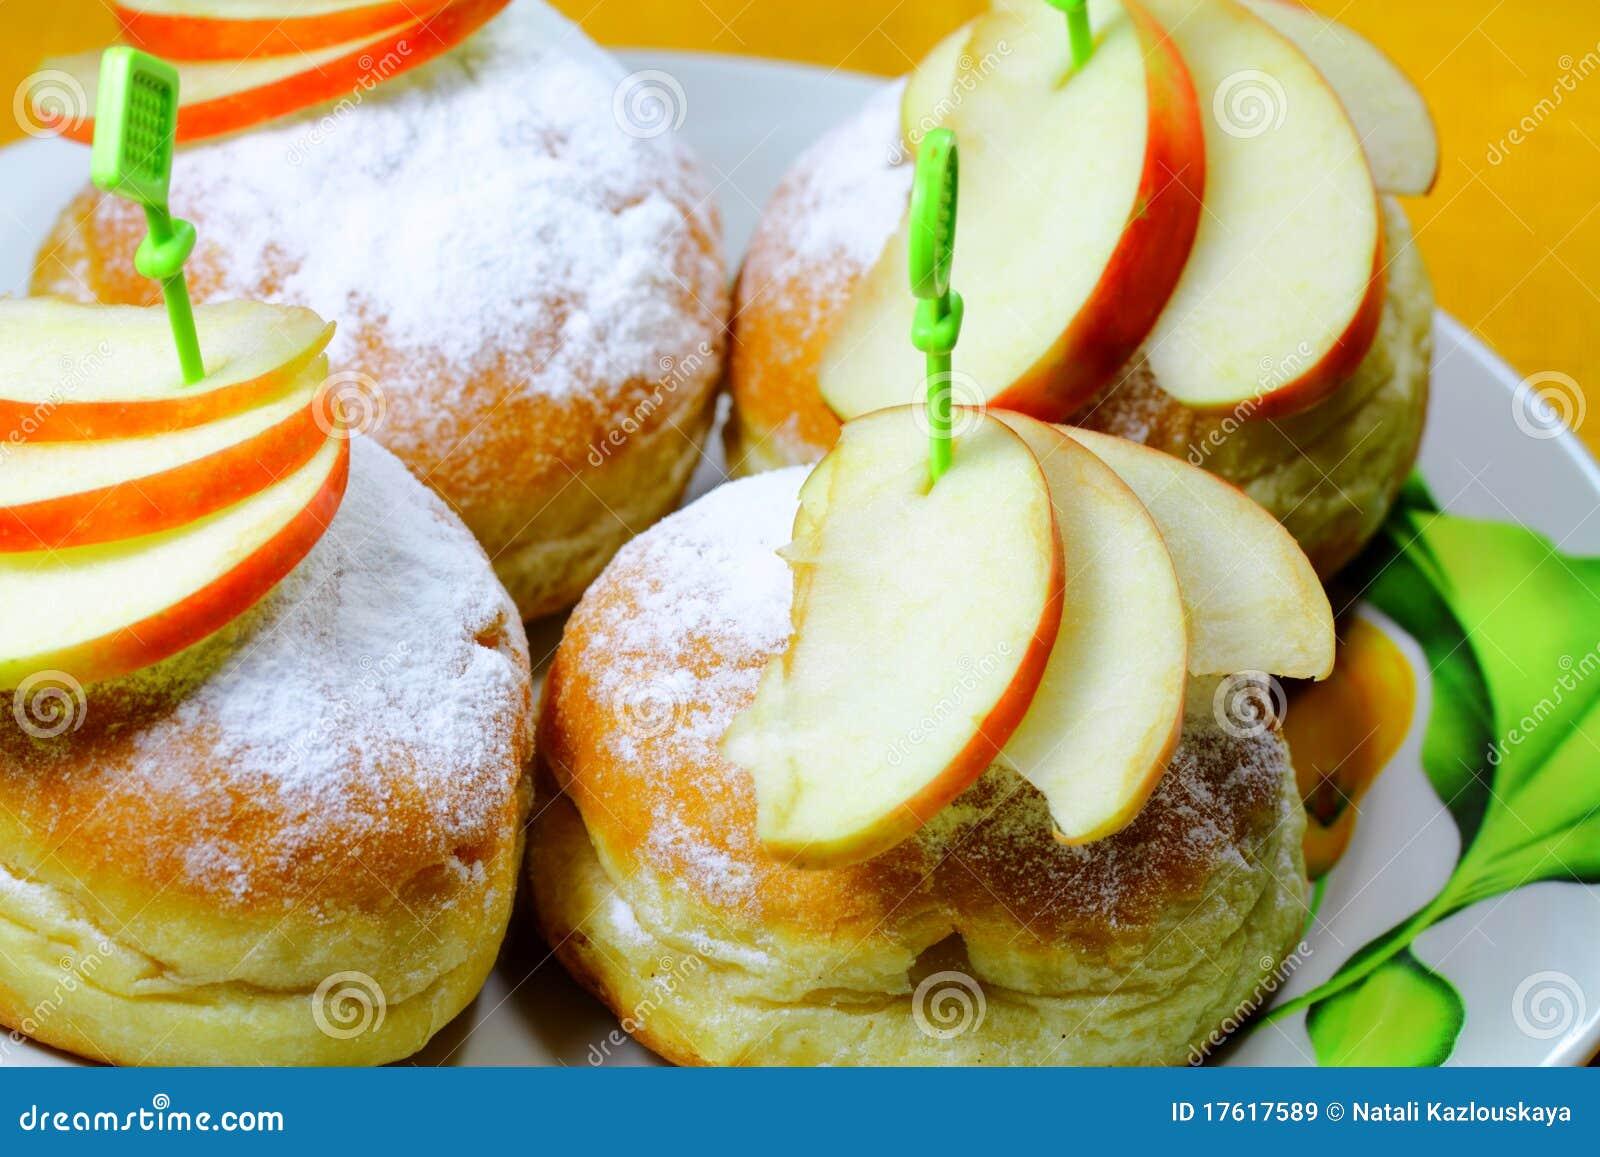 плюшки яблока соединяют некоторое вкусное